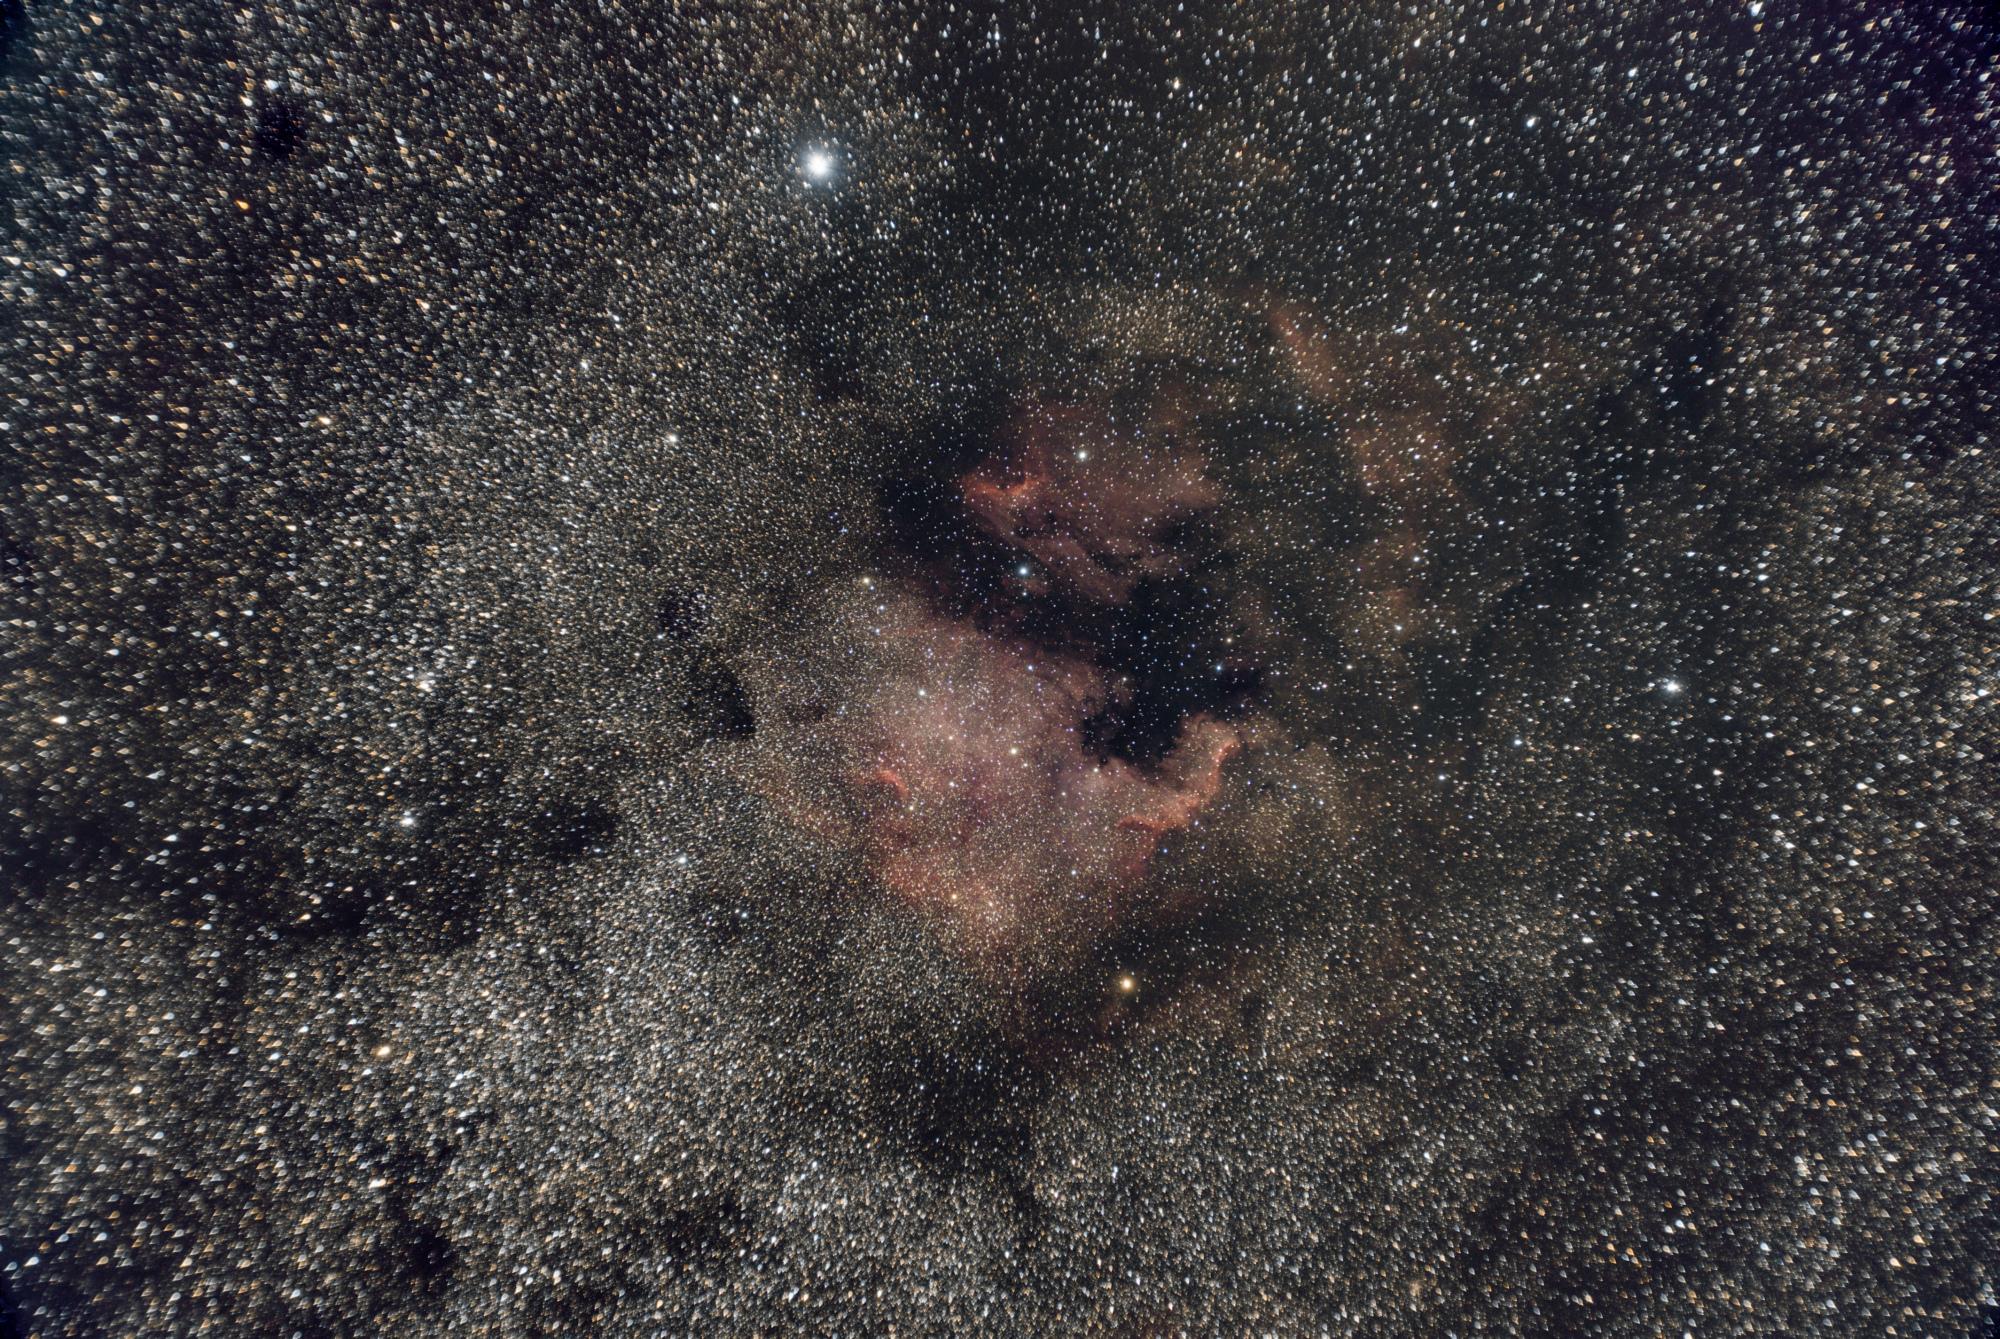 NGC700_55fl_badBF.thumb.jpg.b3d1785a5316d38222dc0d65da606f98.jpg